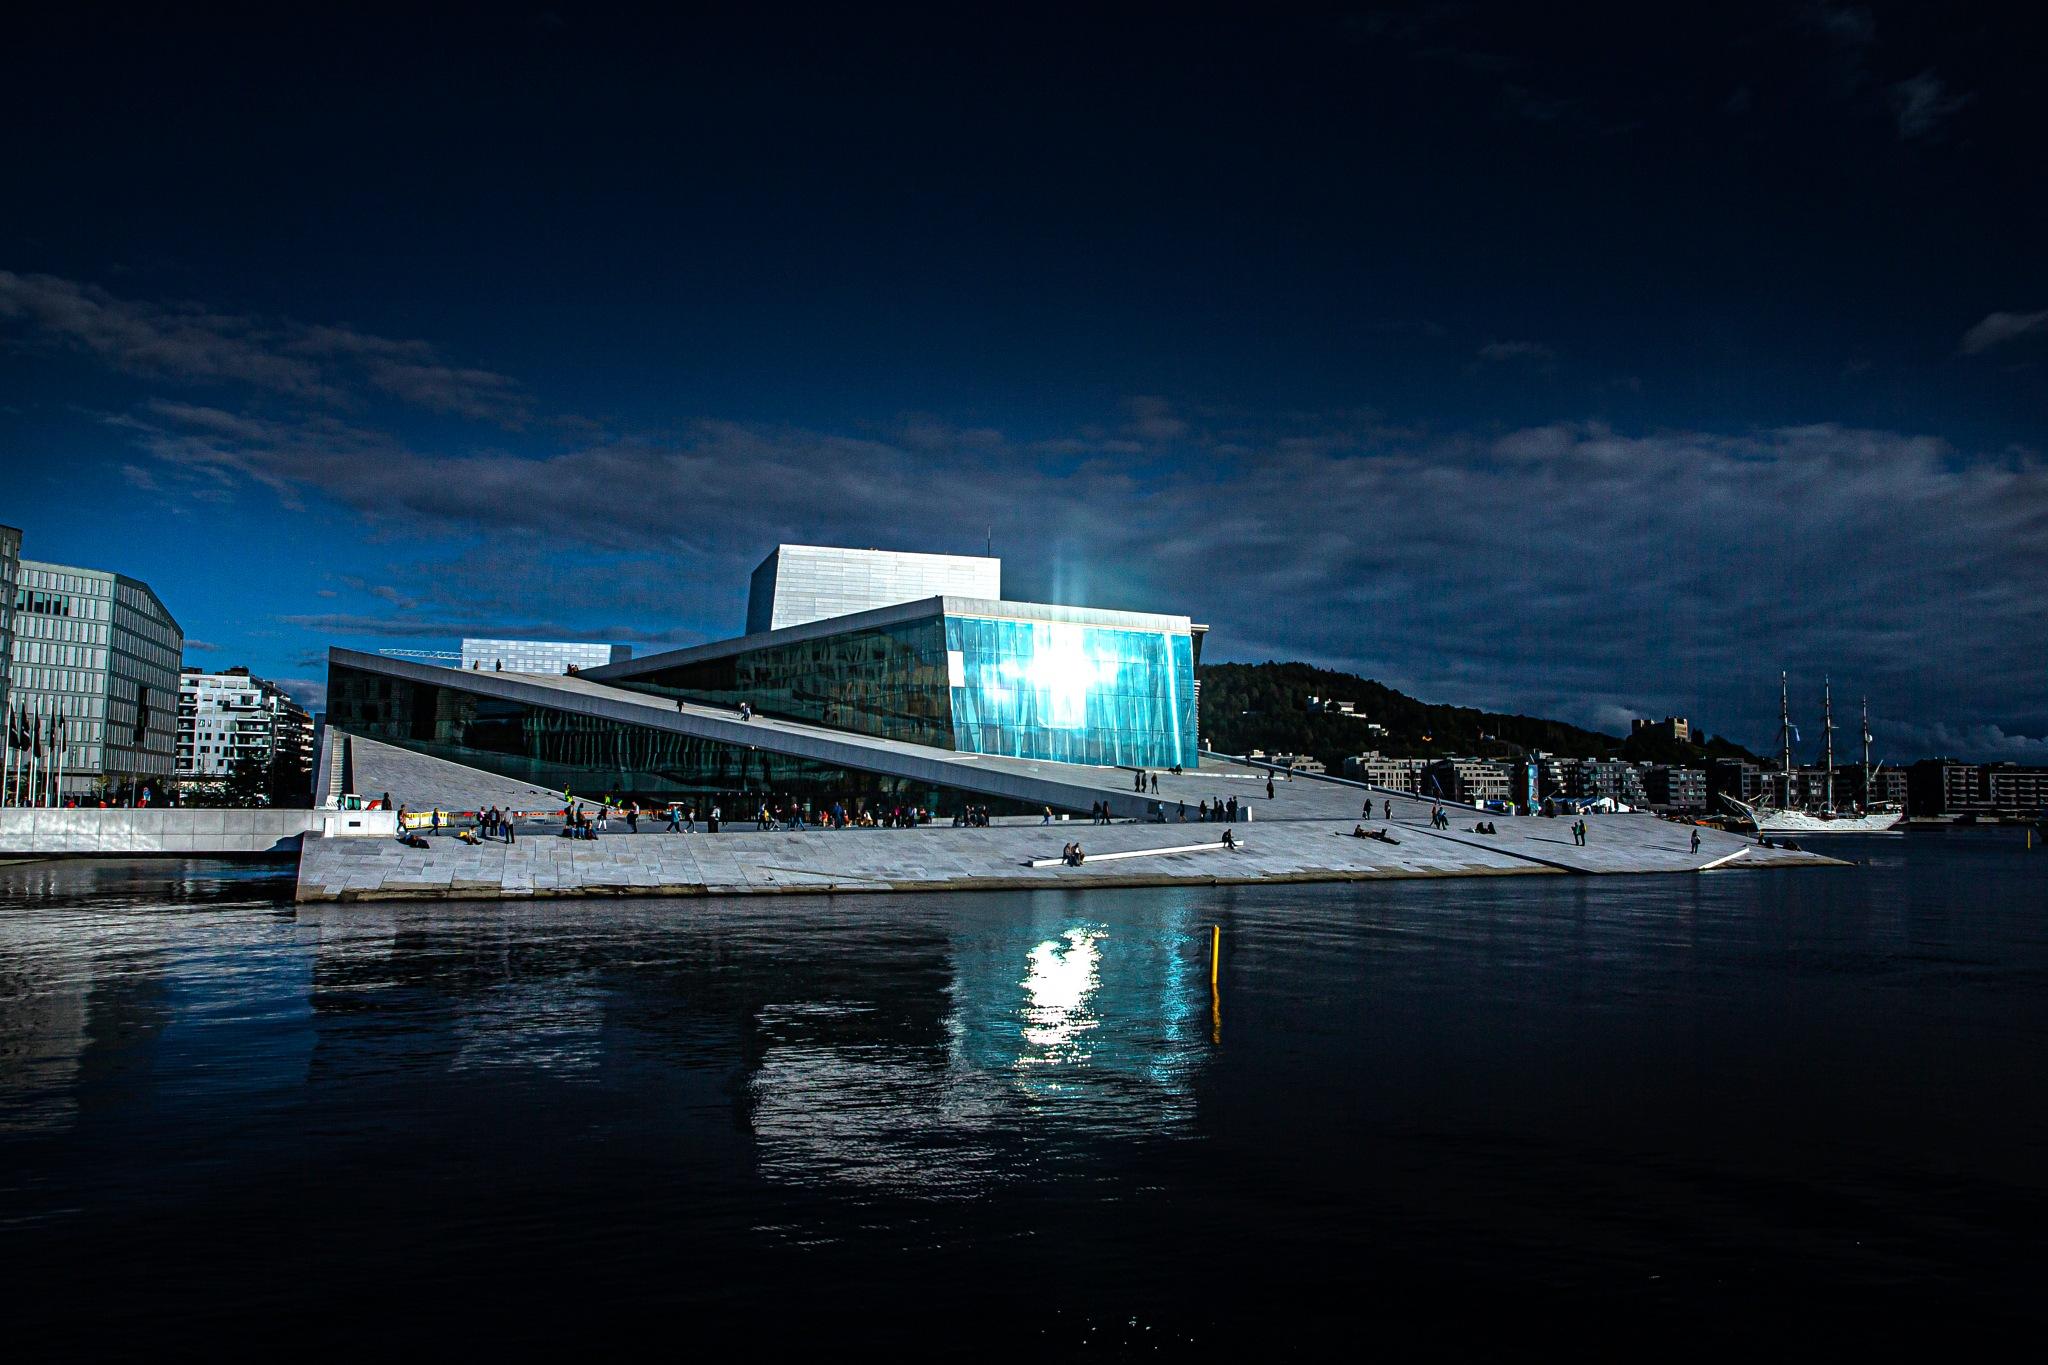 The Opera house ツ by Odd Rune Wang